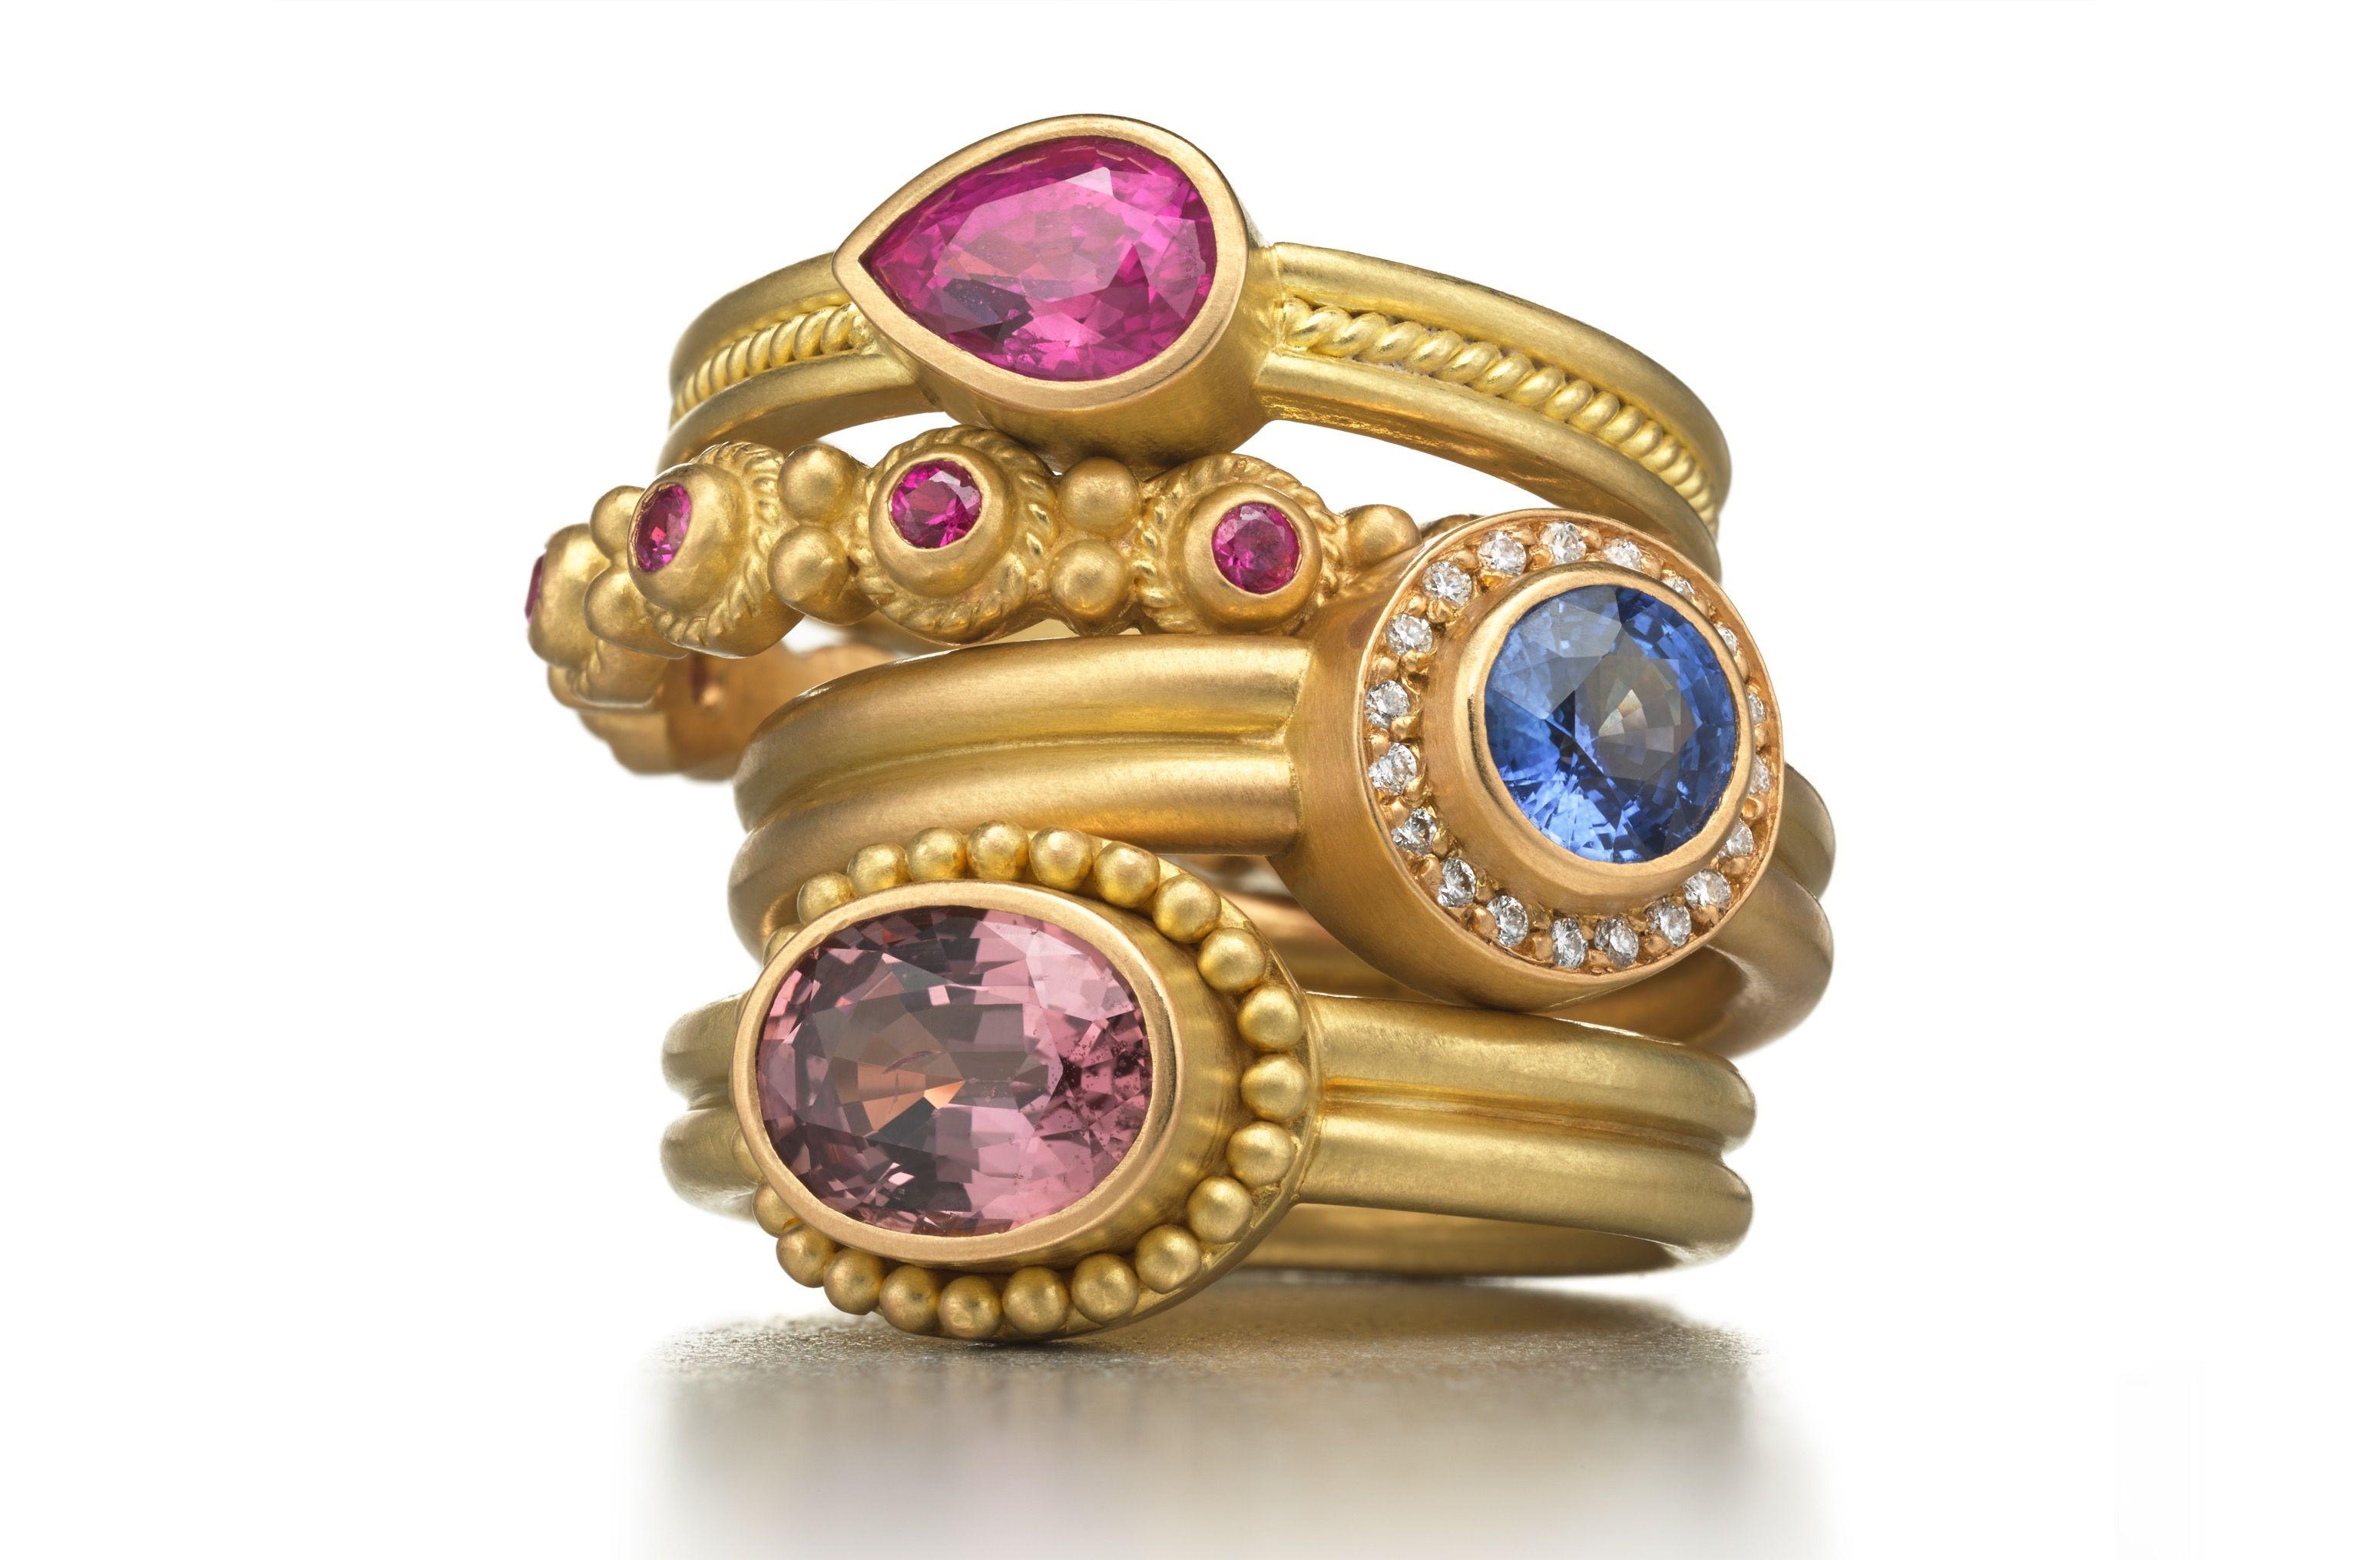 JewelryWhite_23.jpg